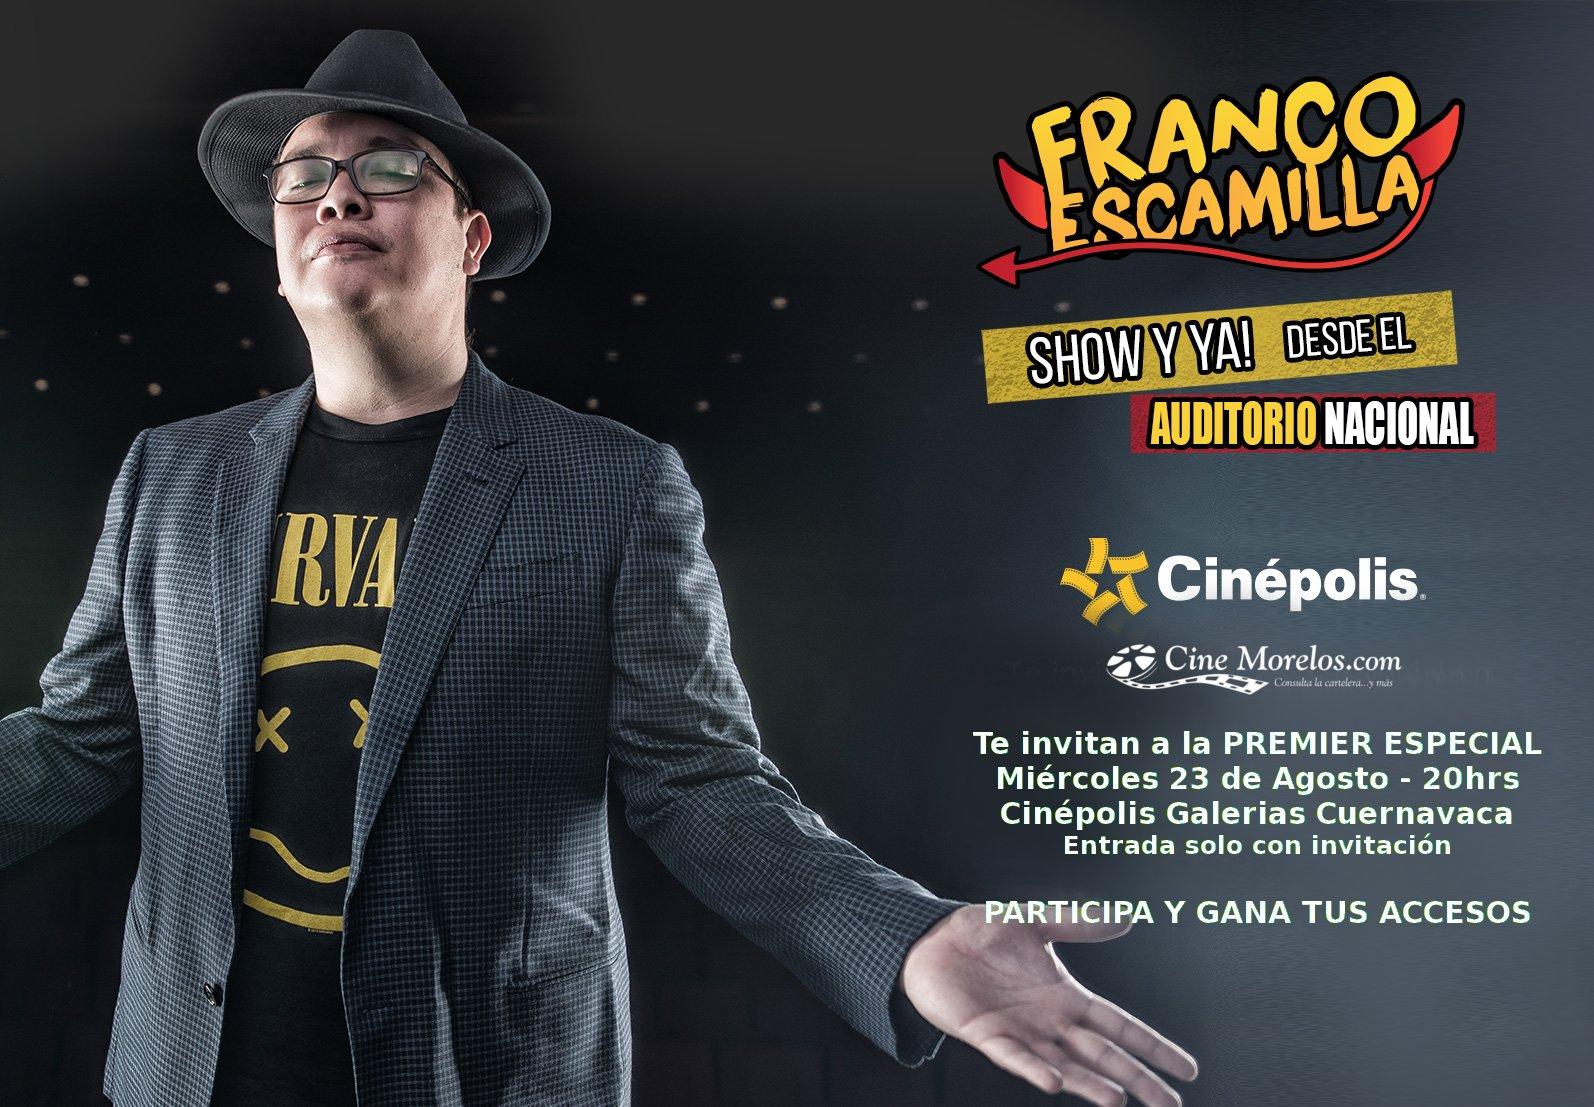 franco escamilla pelicula show cine